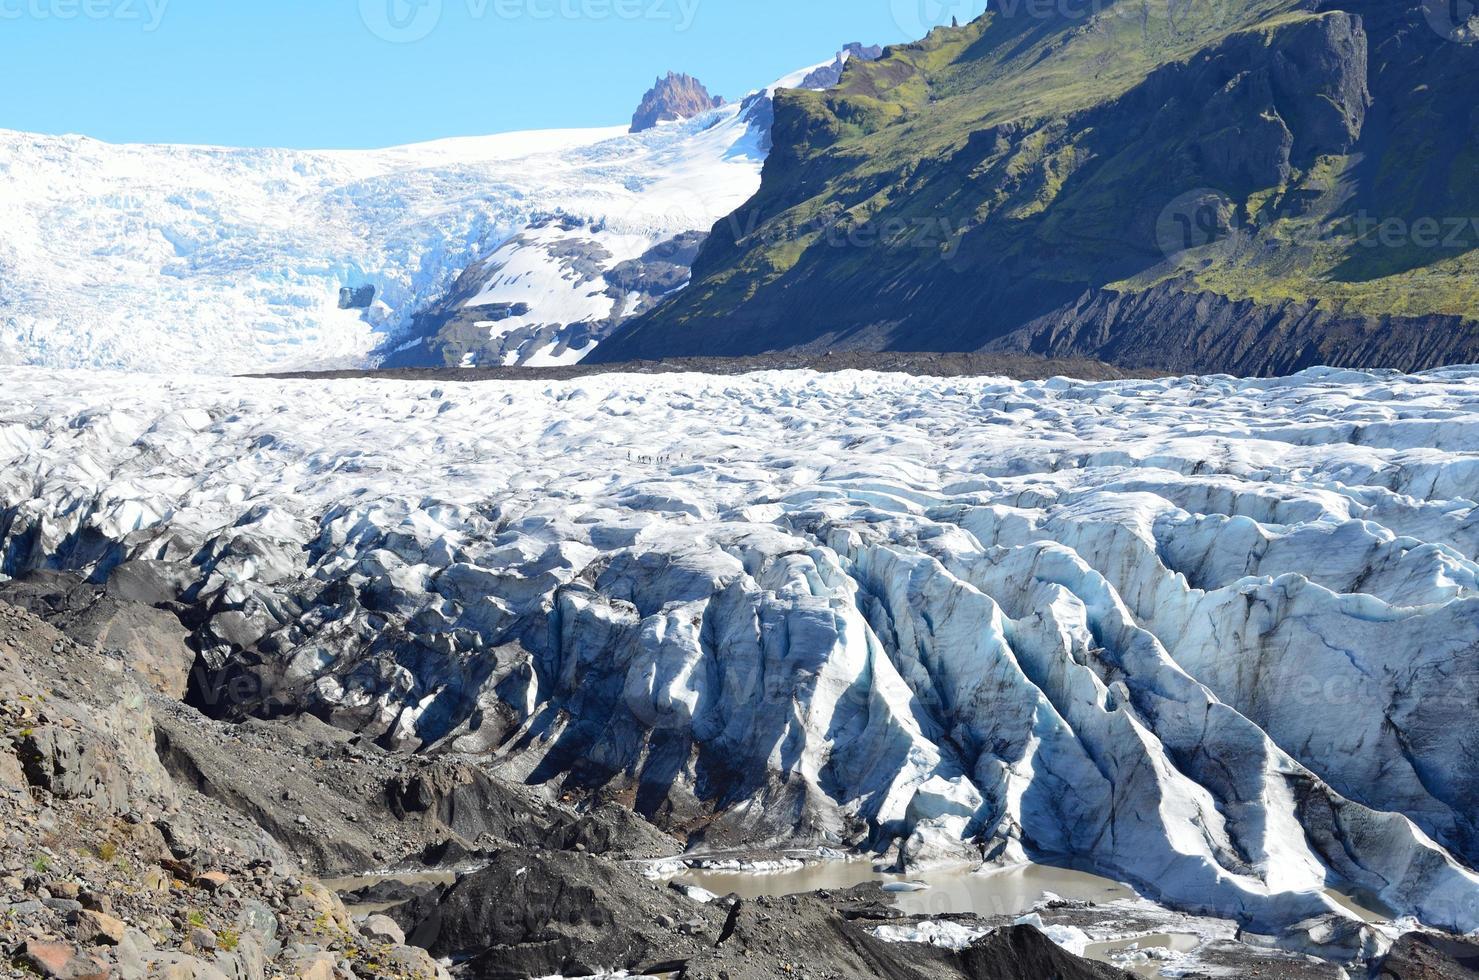 ijsland, gletsjer boven de grootste vulkaan van europa vatnaekutl foto